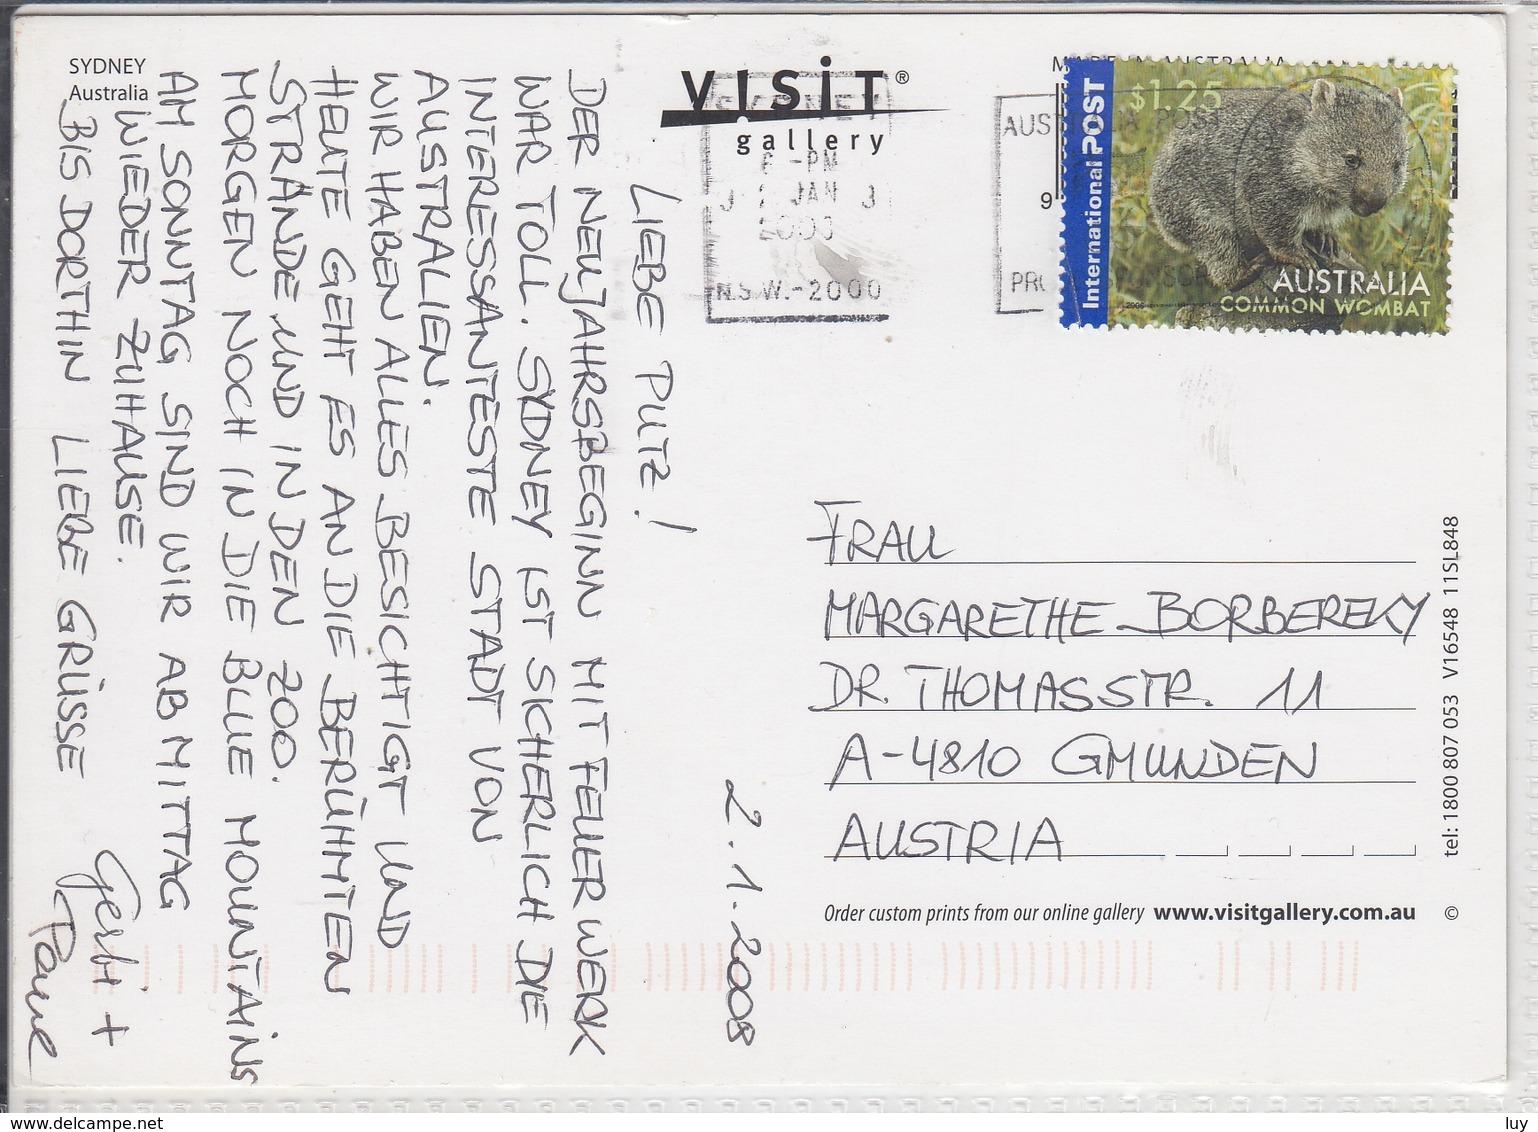 SYDNEY  AUSTRALIA  MULTI VIEW  USED  NICE STAMP WITH COMMON WOMBAT - Sydney